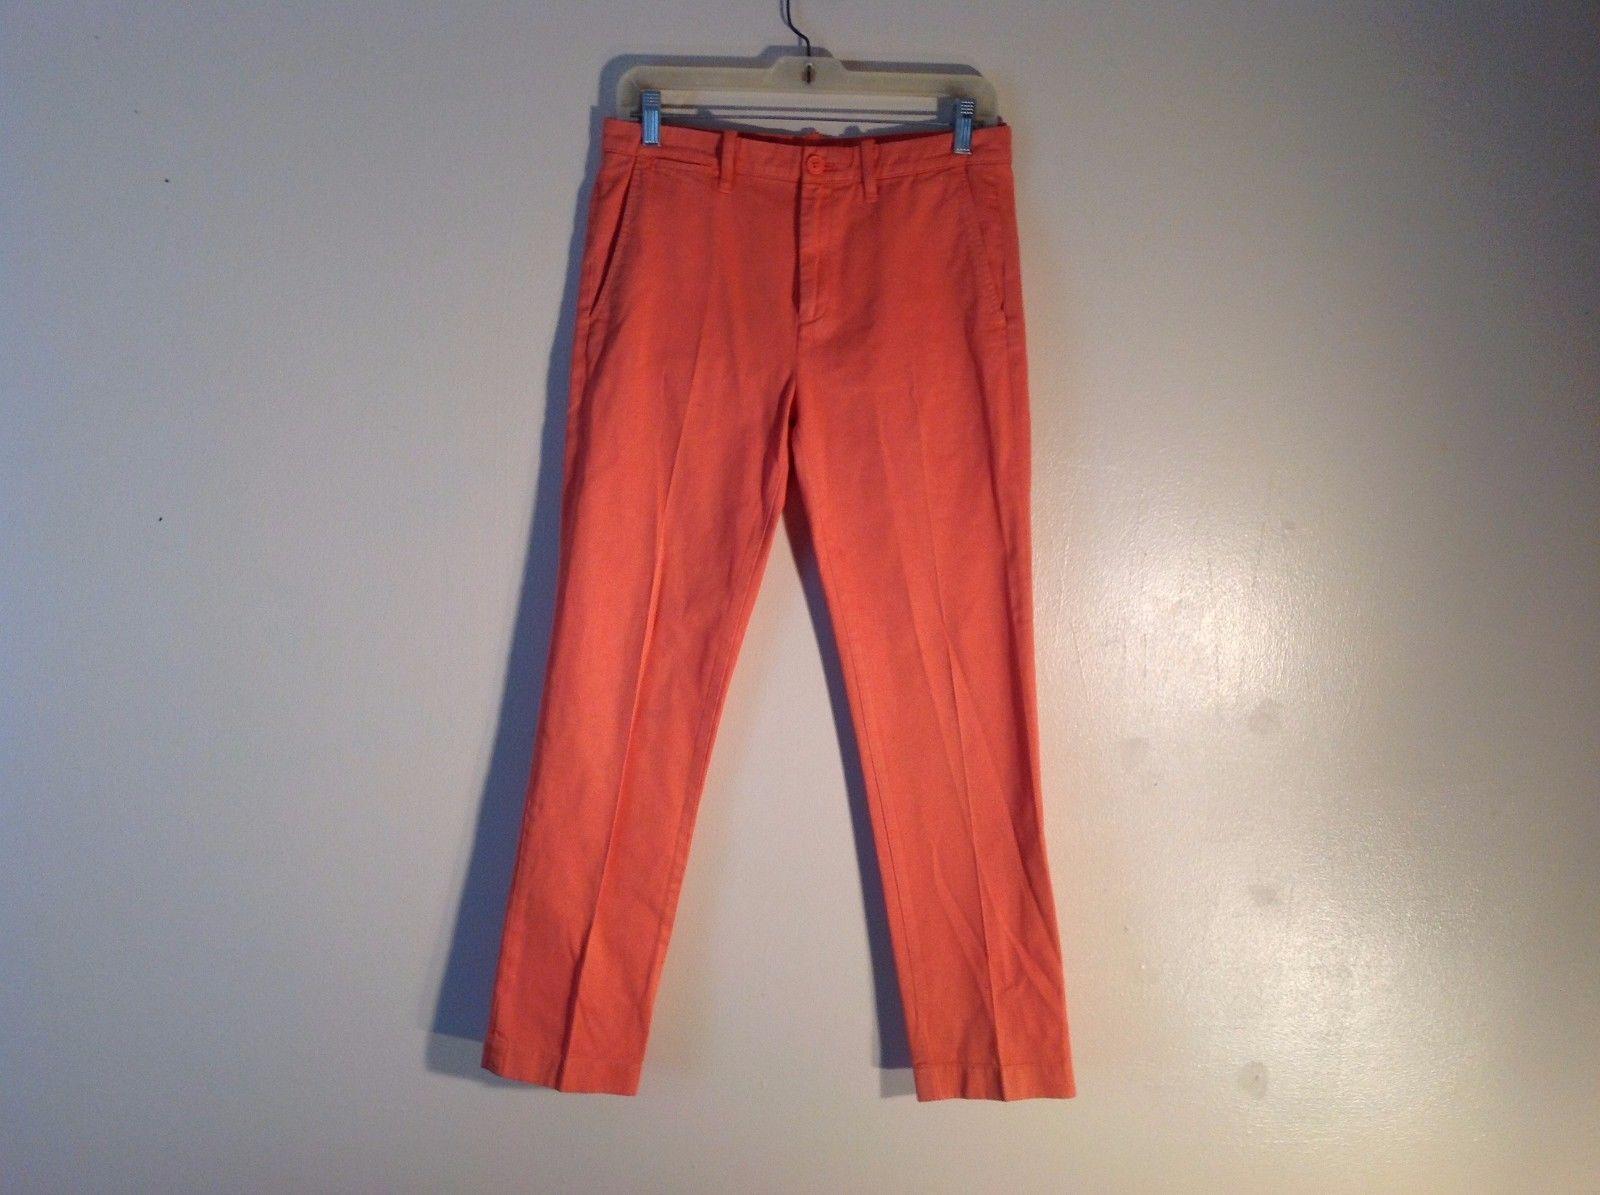 Used Condition Crew Cuts Size 14 Orange Slim Sun Faded Pants 100% Cotton